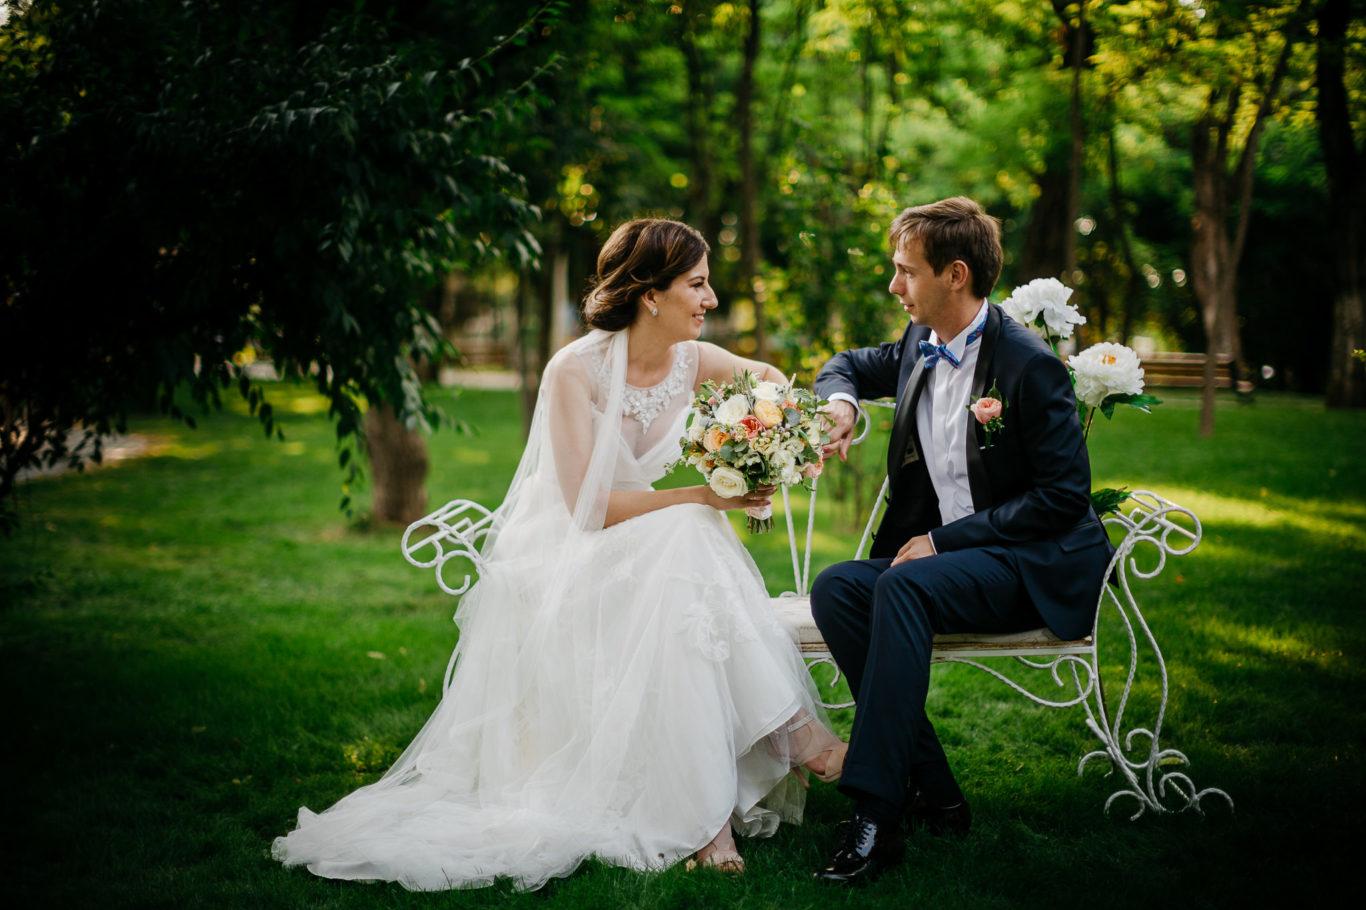 0491-Fotografie-nunta-Bucuresti-Oana-Catalin-fotograf-Ciprian-Dumitrescu-CDF_0950